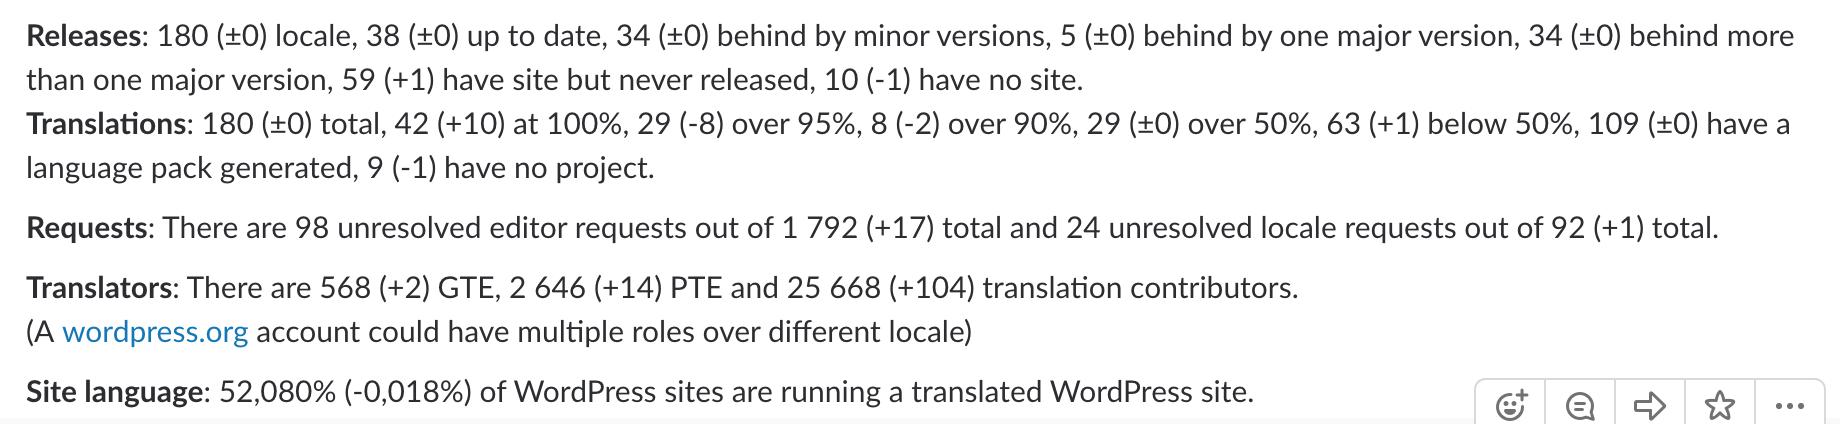 Polyglots Stats